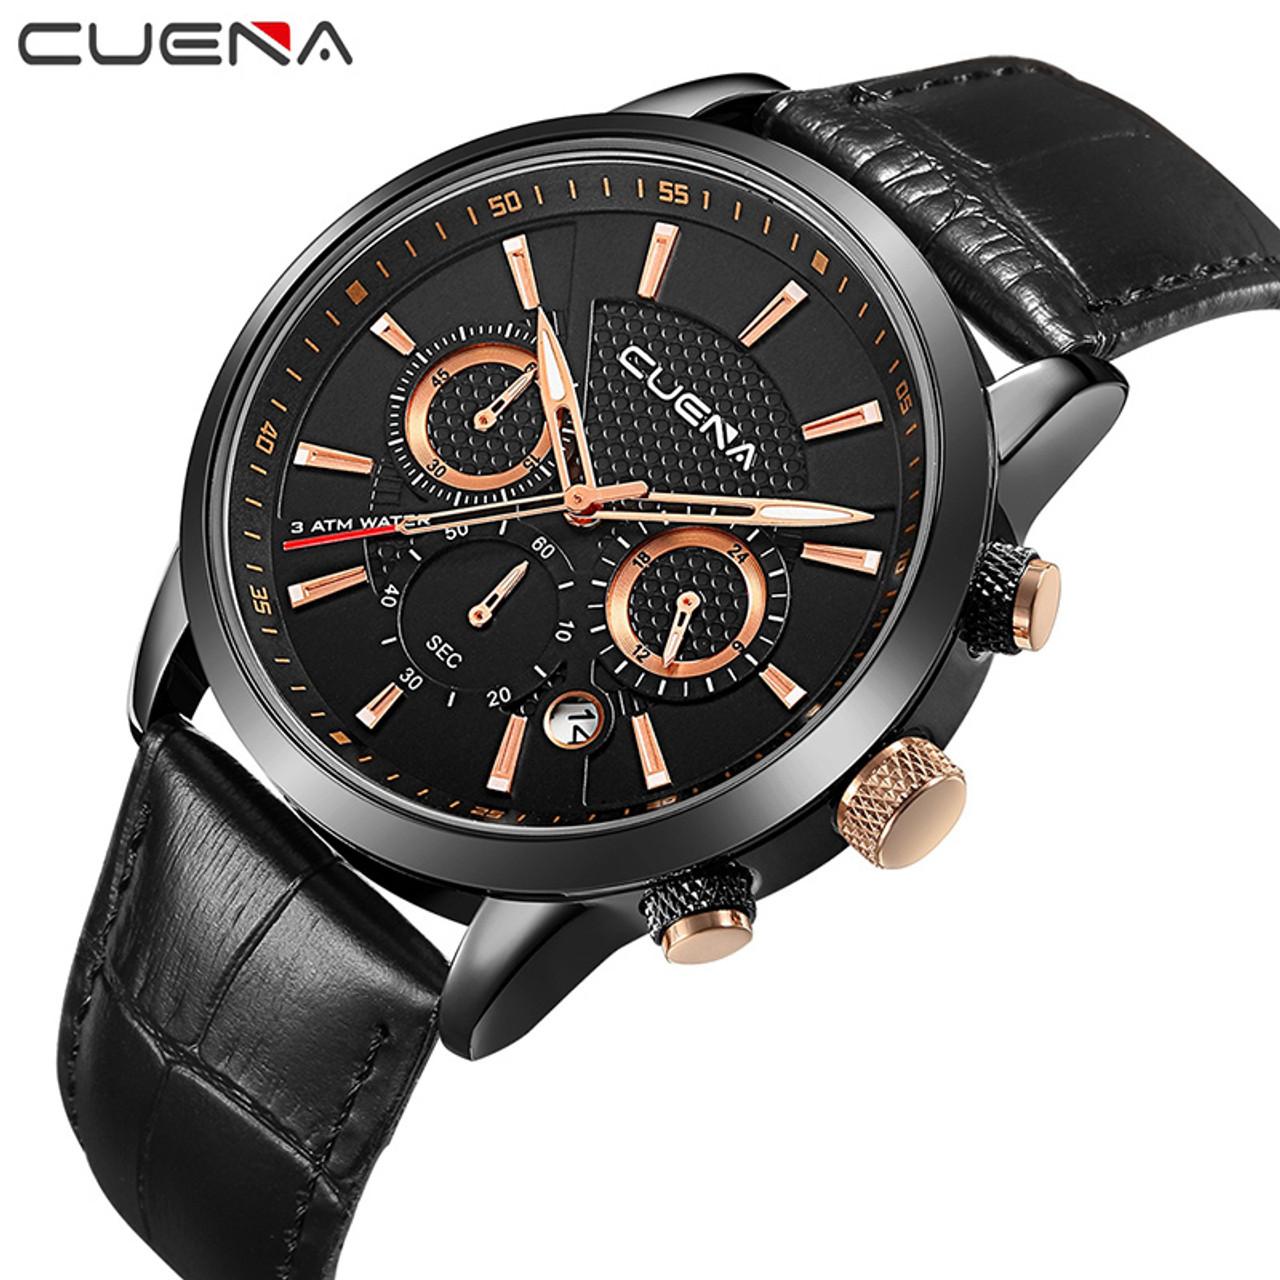 7e1b90f5e192 CUENA Brand Fashion Casual Watches Men Watch Genuine Leather Relojes  Waterproof Quartz Wristwatches Man Clock Relogio ...